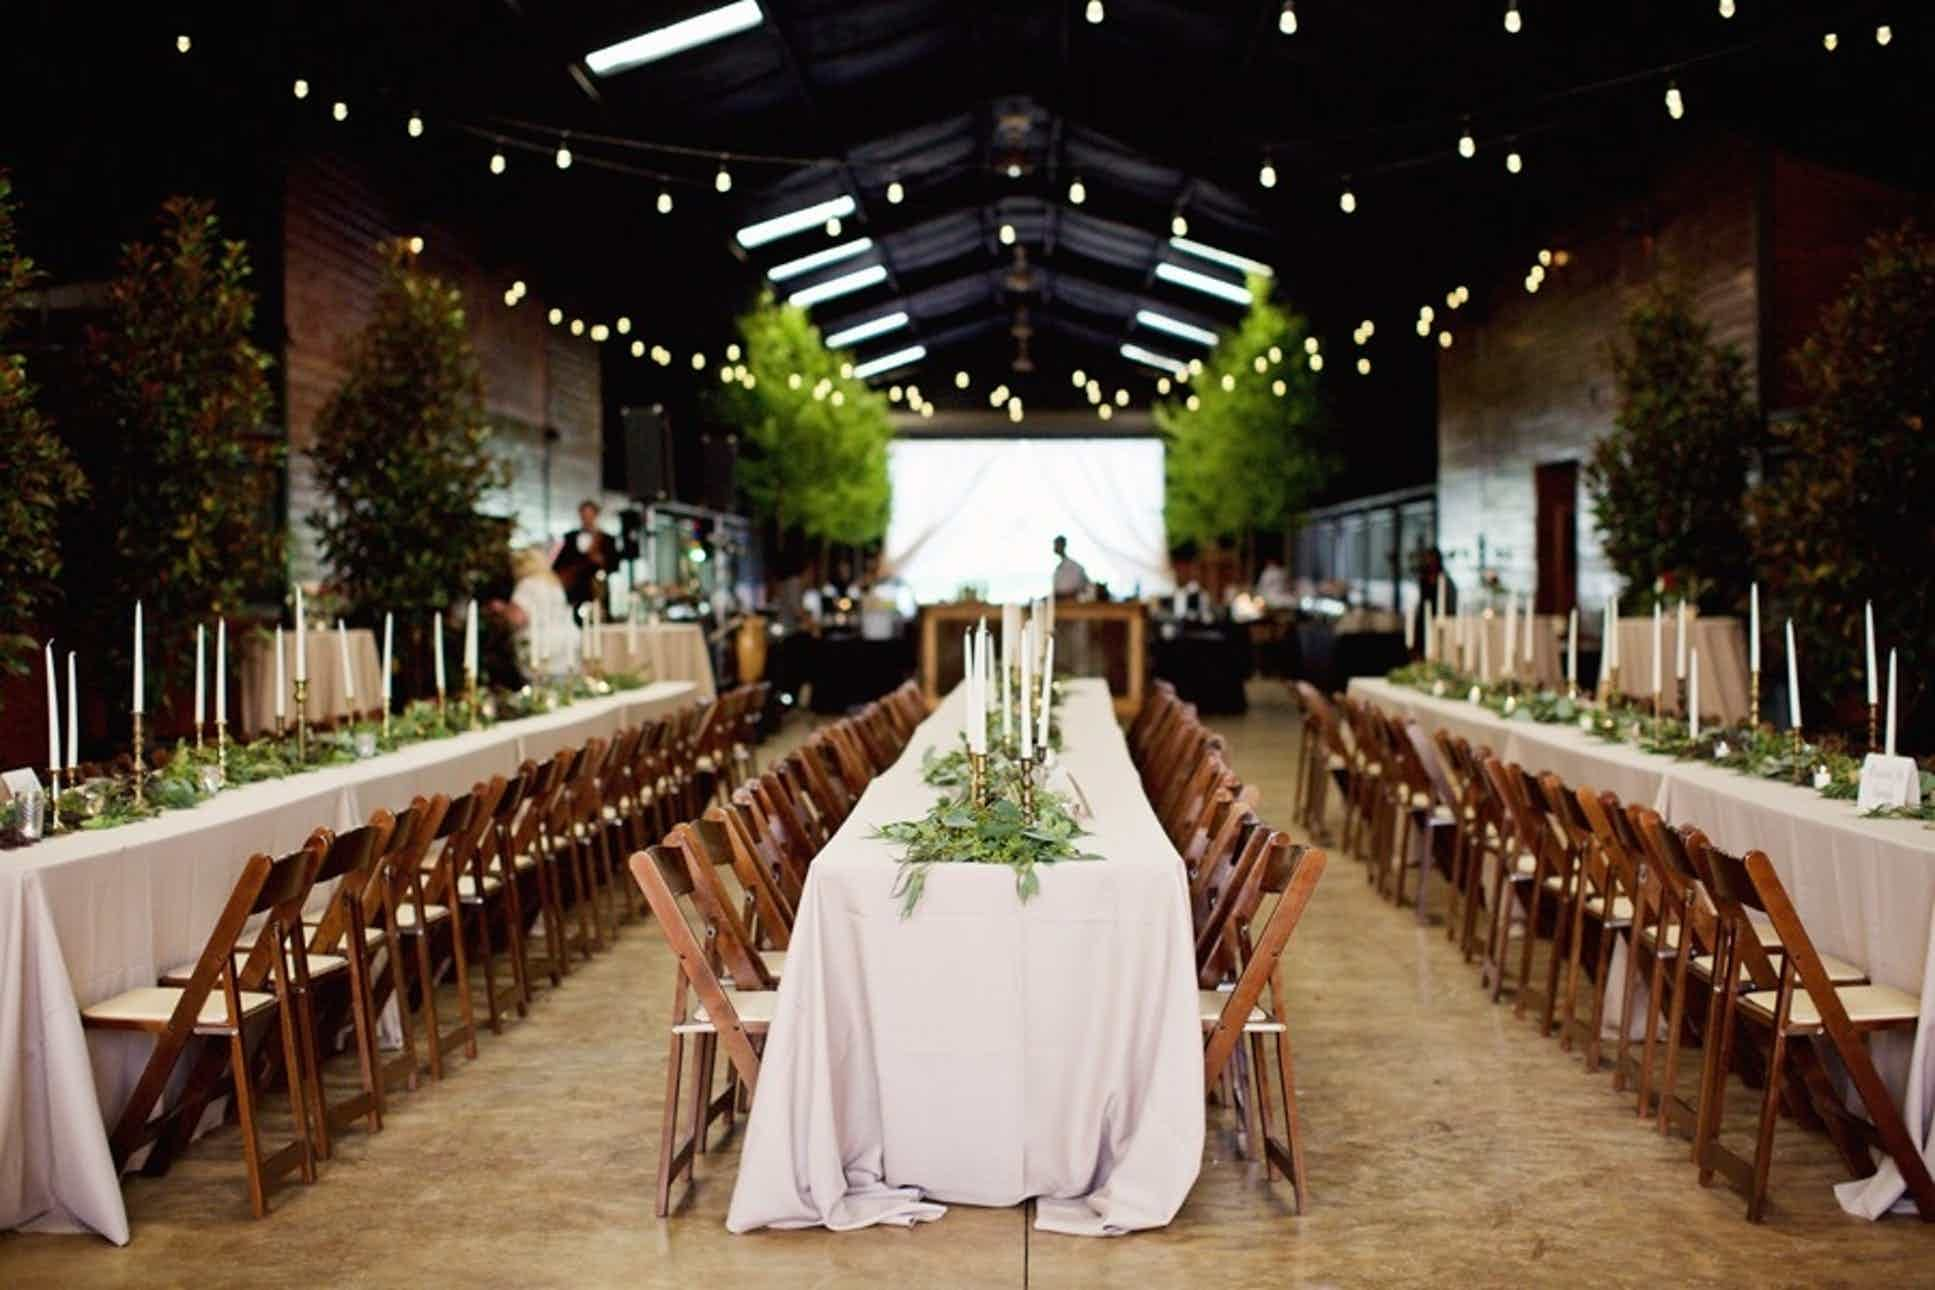 The Farm at High Shoals Wedding Venue GA 30621